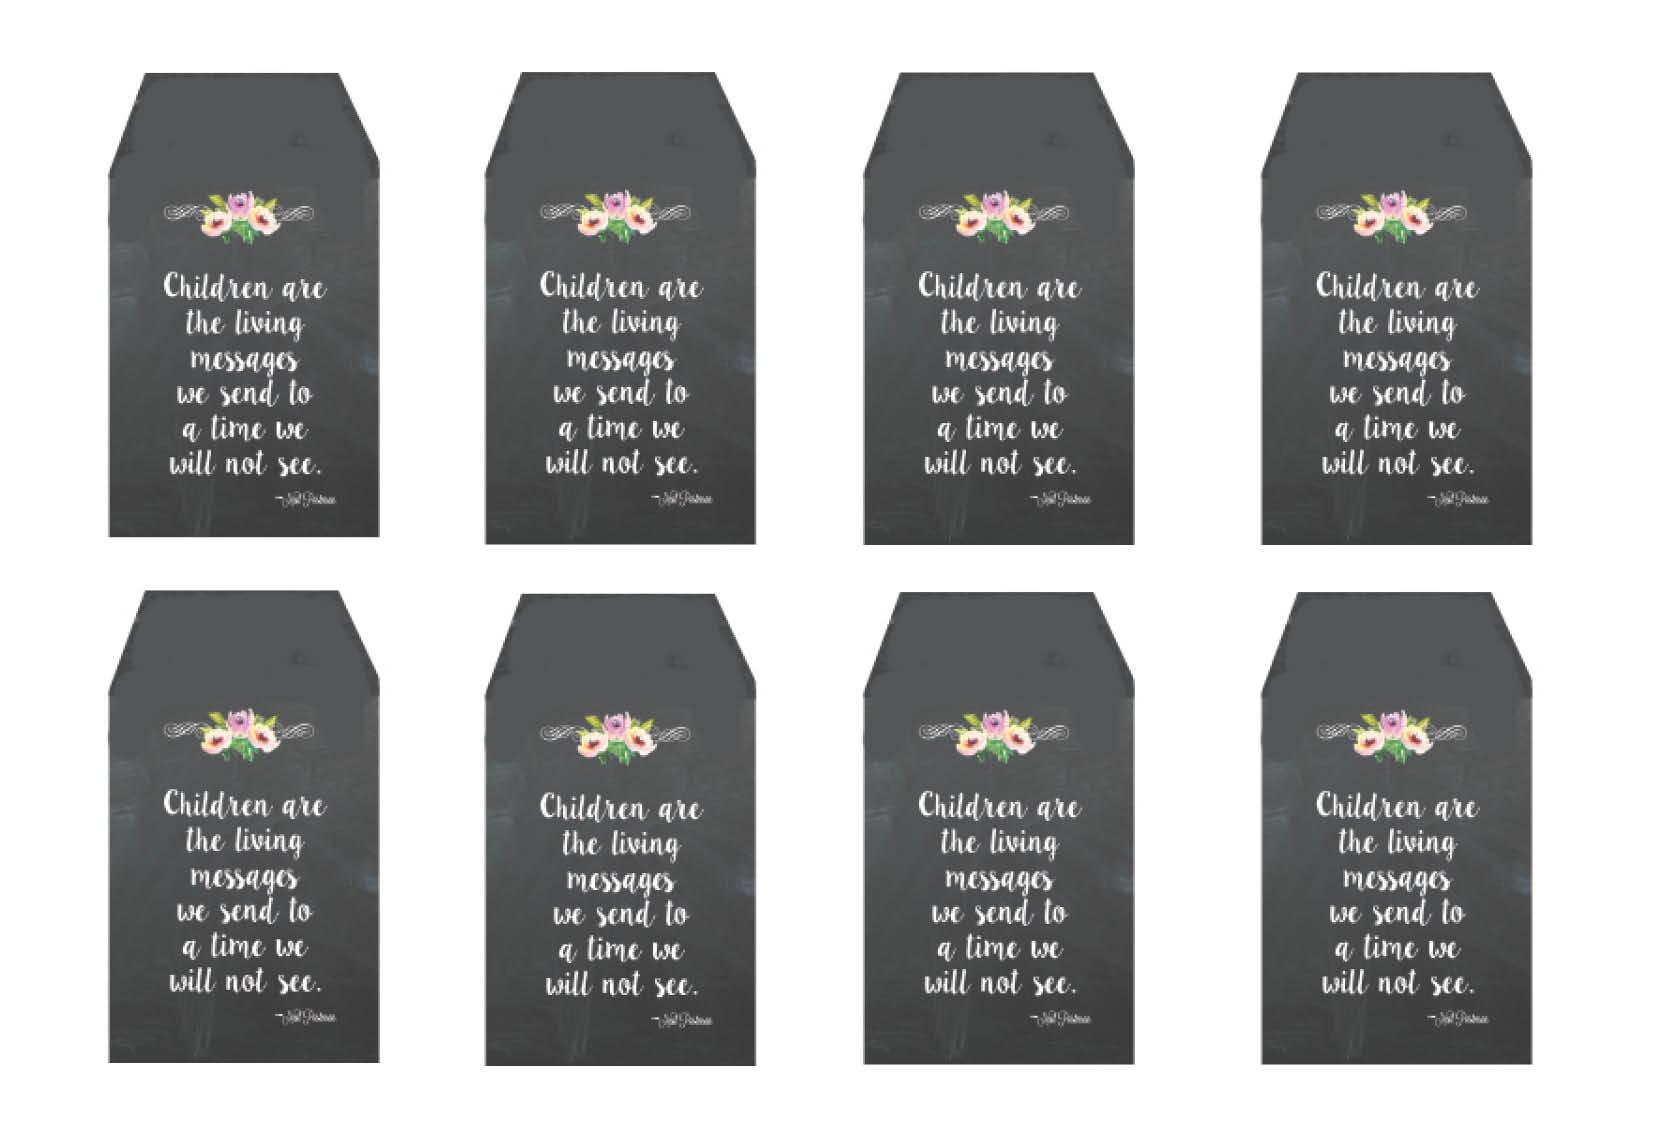 Teacher Appreciation And Free Printable Teacher Gift Tags | 11 - Free Printable Tags For Teacher Appreciation